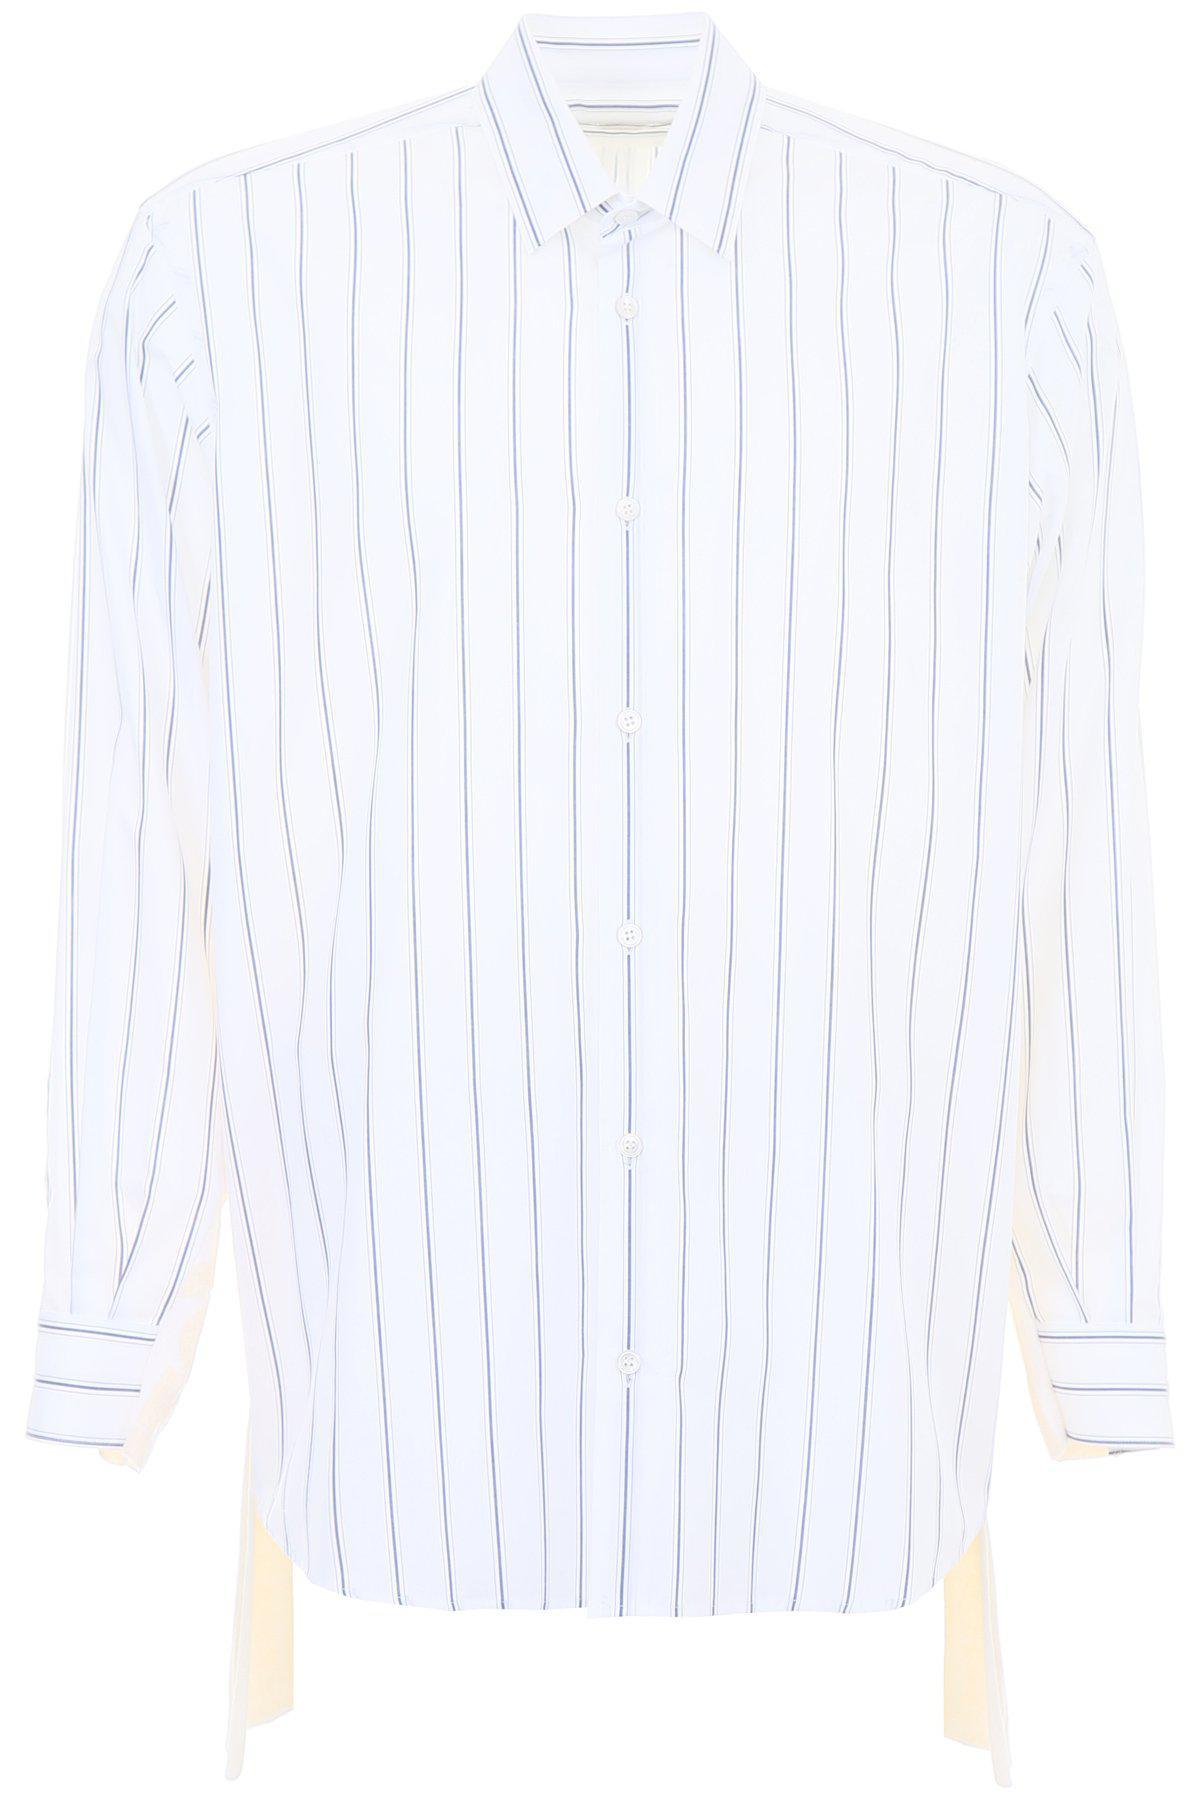 a0365e27 Stella Mccartney Striped Shirt in White for Men - Lyst